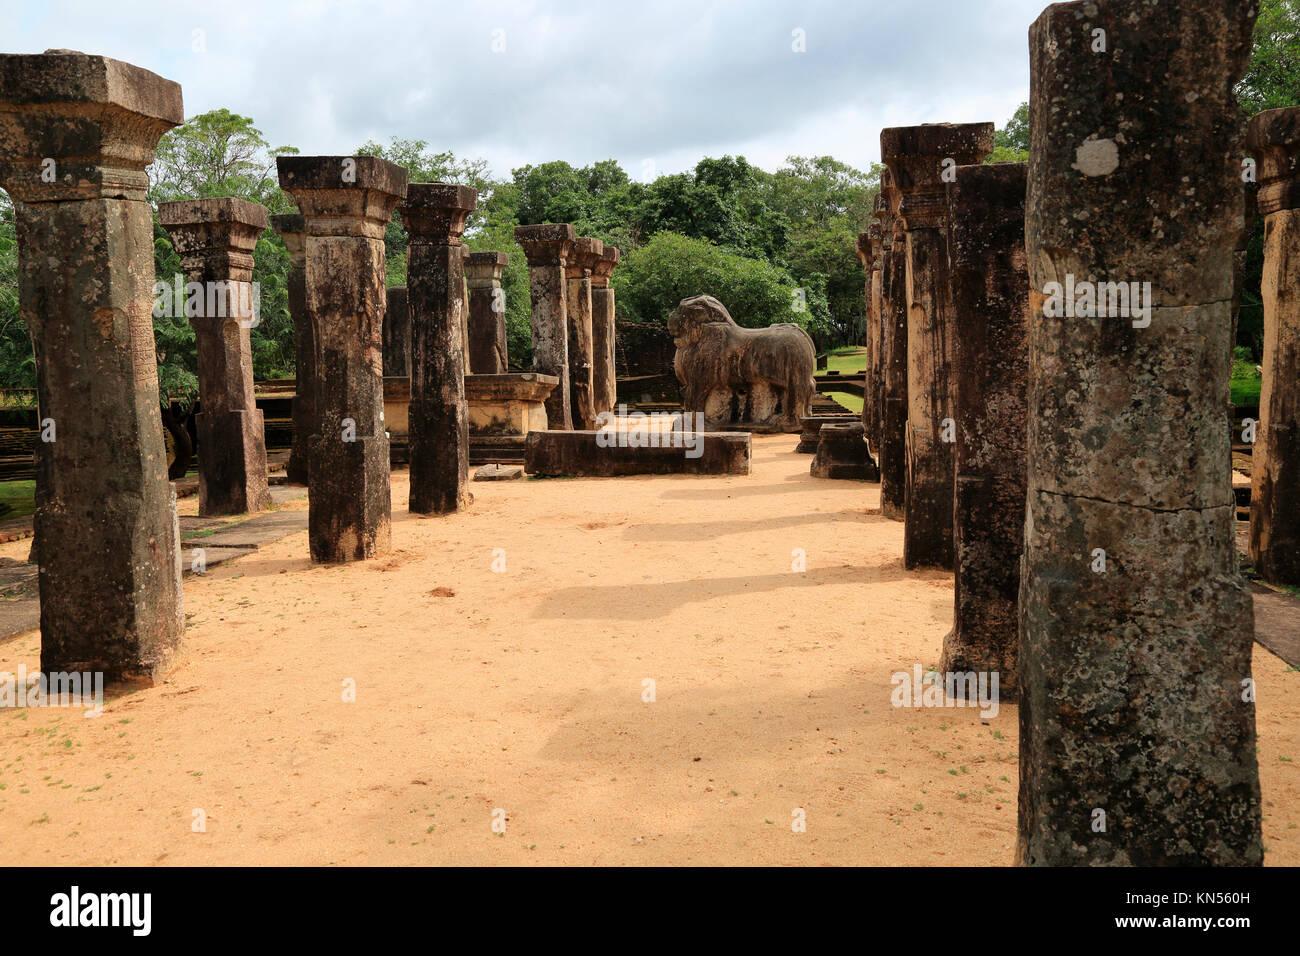 Council Chamber, Island Park, UNESCO World Heritage Site, the ancient city of Polonnaruwa, Sri Lanka, Asia - Stock Image